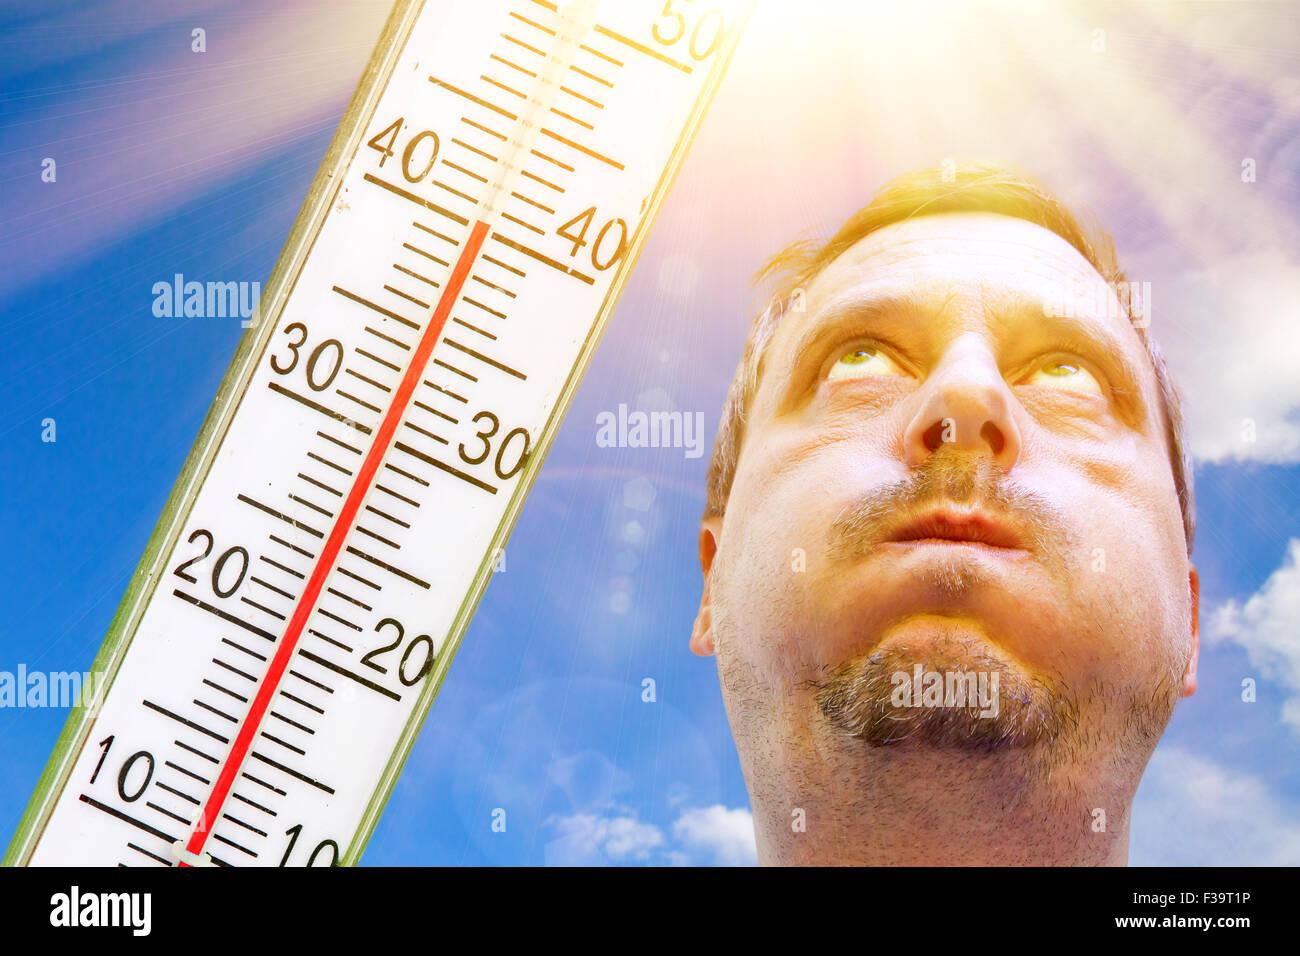 Mann an sehr heißen Tag Stockbild